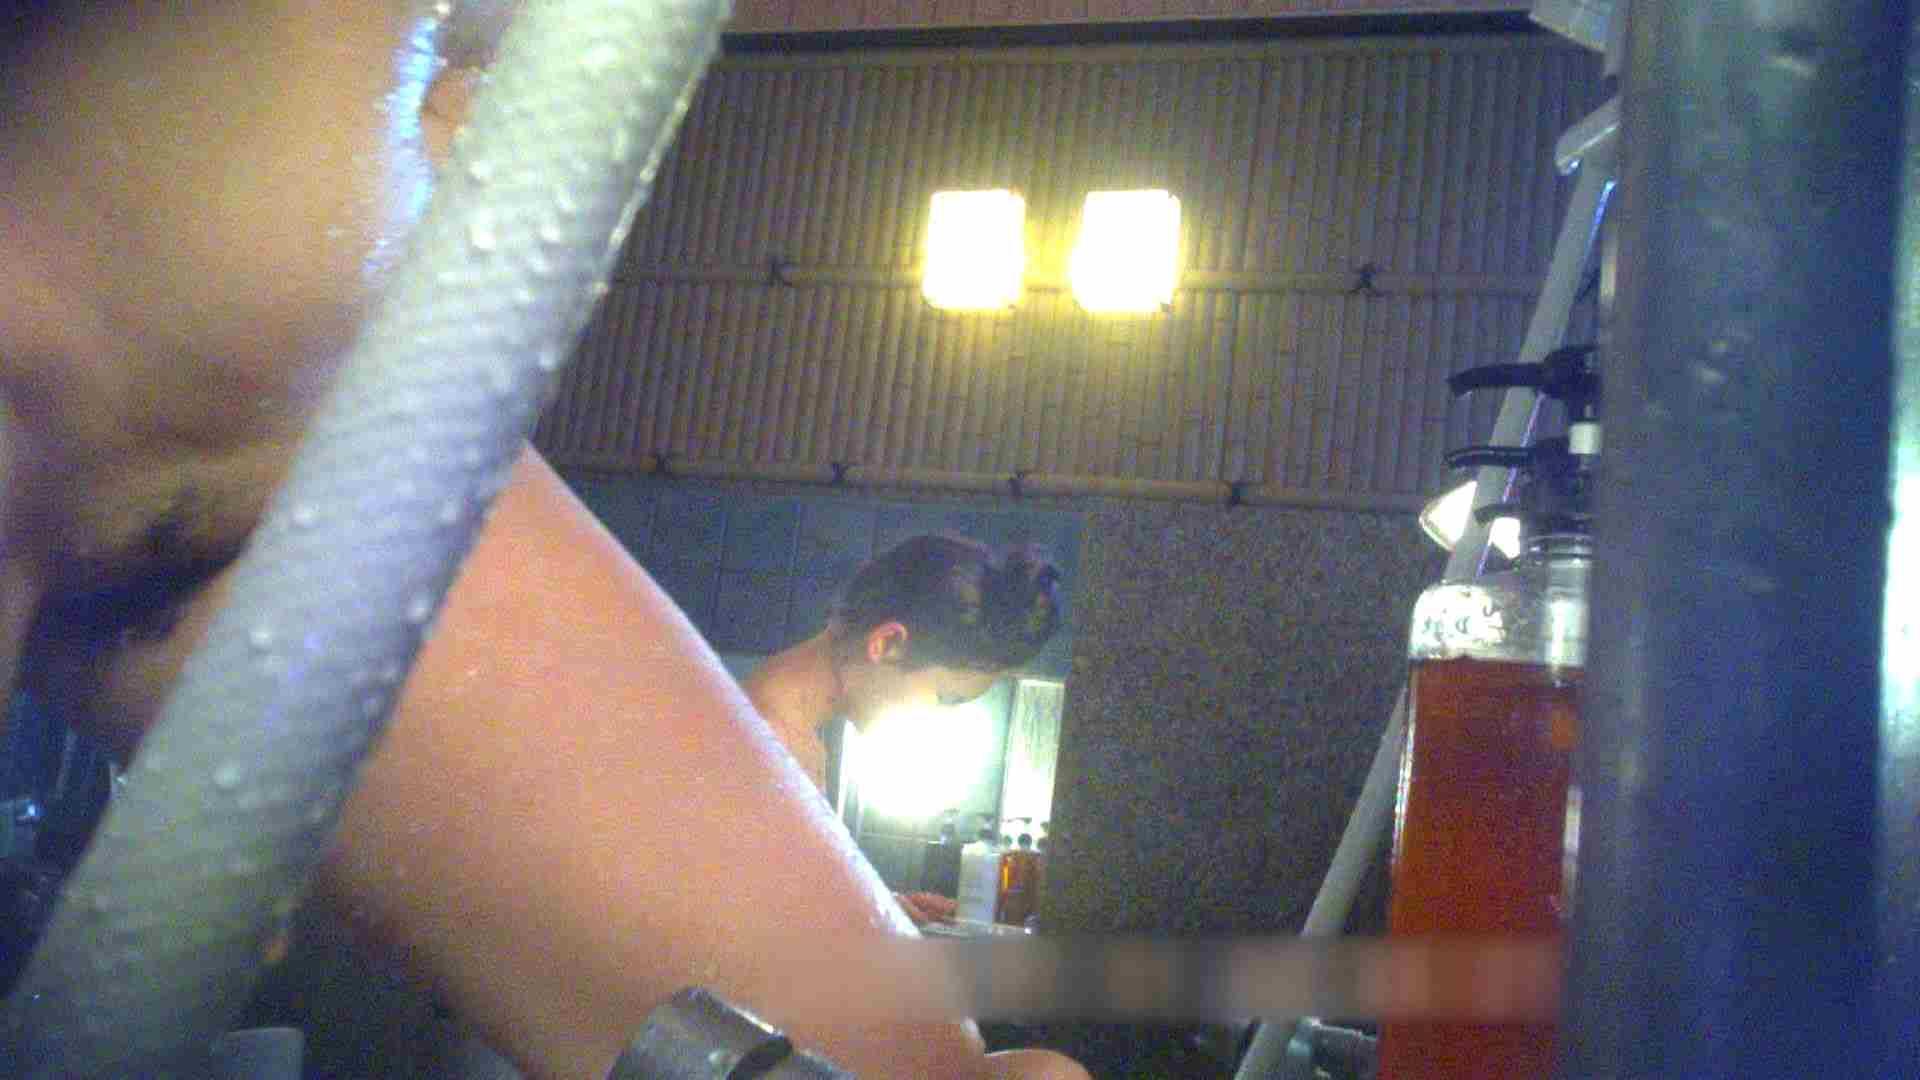 TG.15 【上等兵】高級旅館の爆乳女将で有名っぽい 爆乳 えろ無修正画像 110枚 107